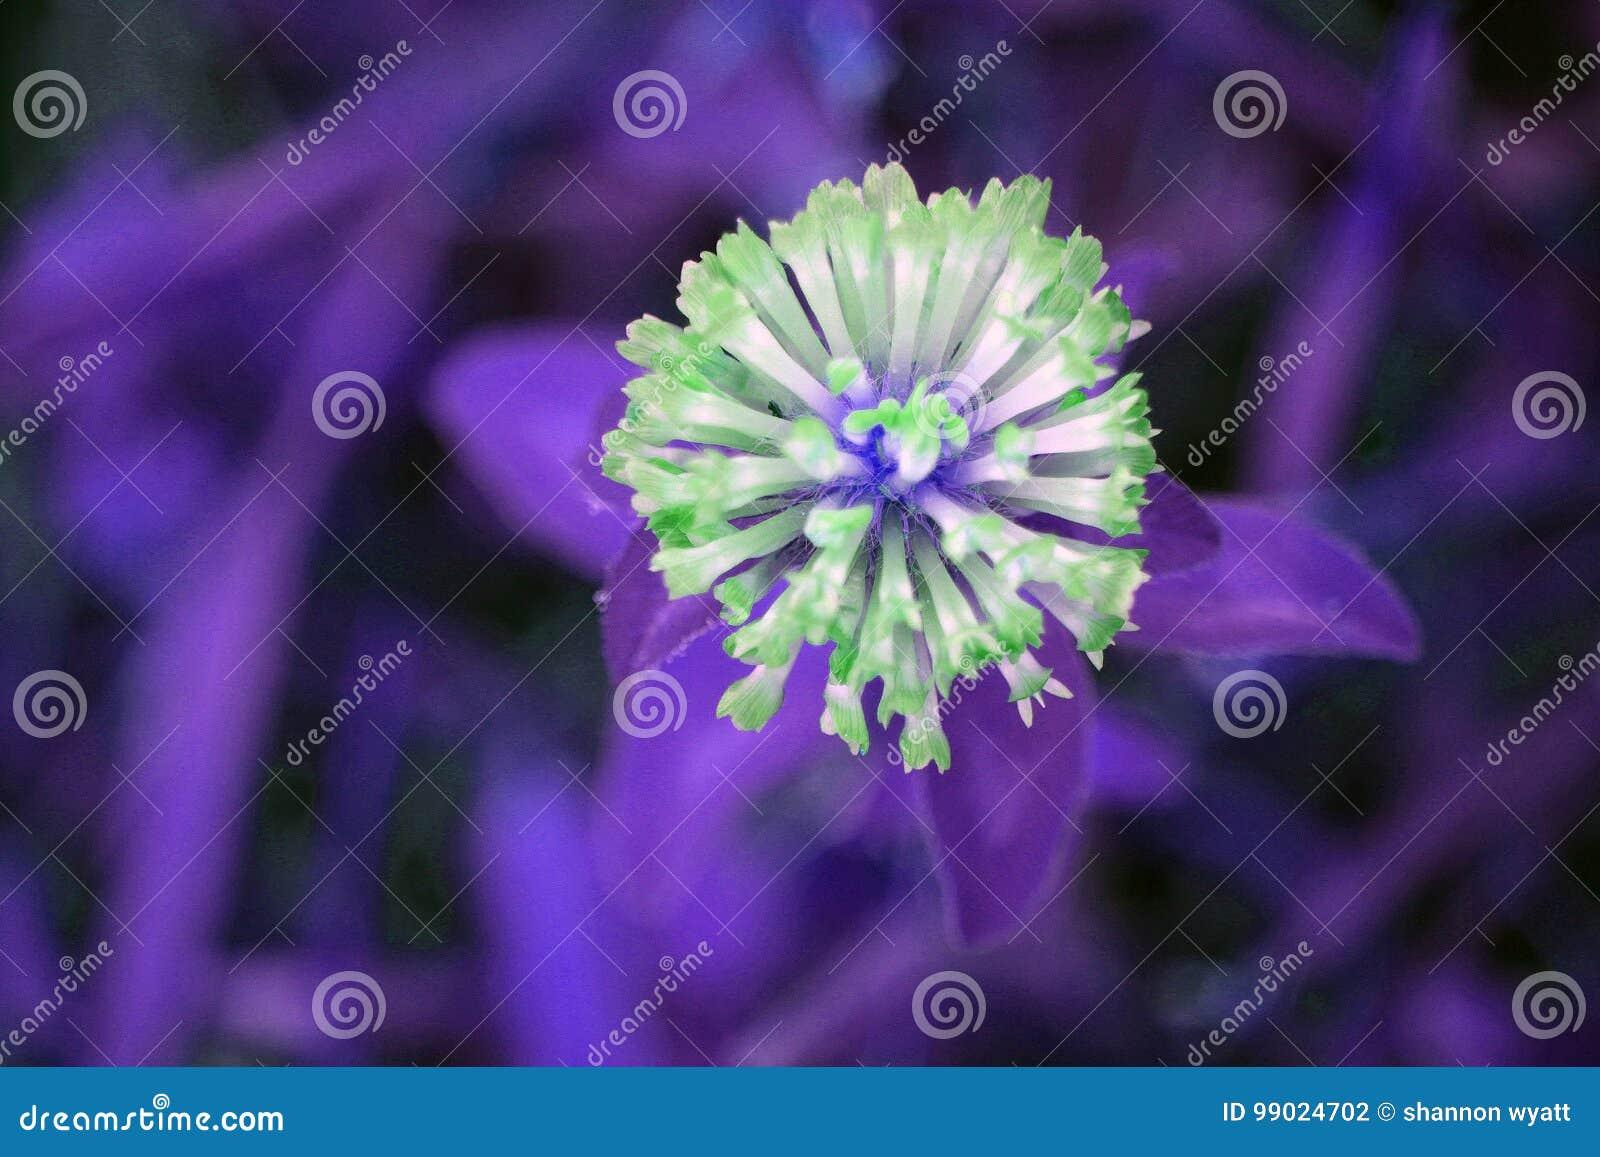 Neon Crown Vetch Stock Photo Image Of Neon Purple Petals 99024702